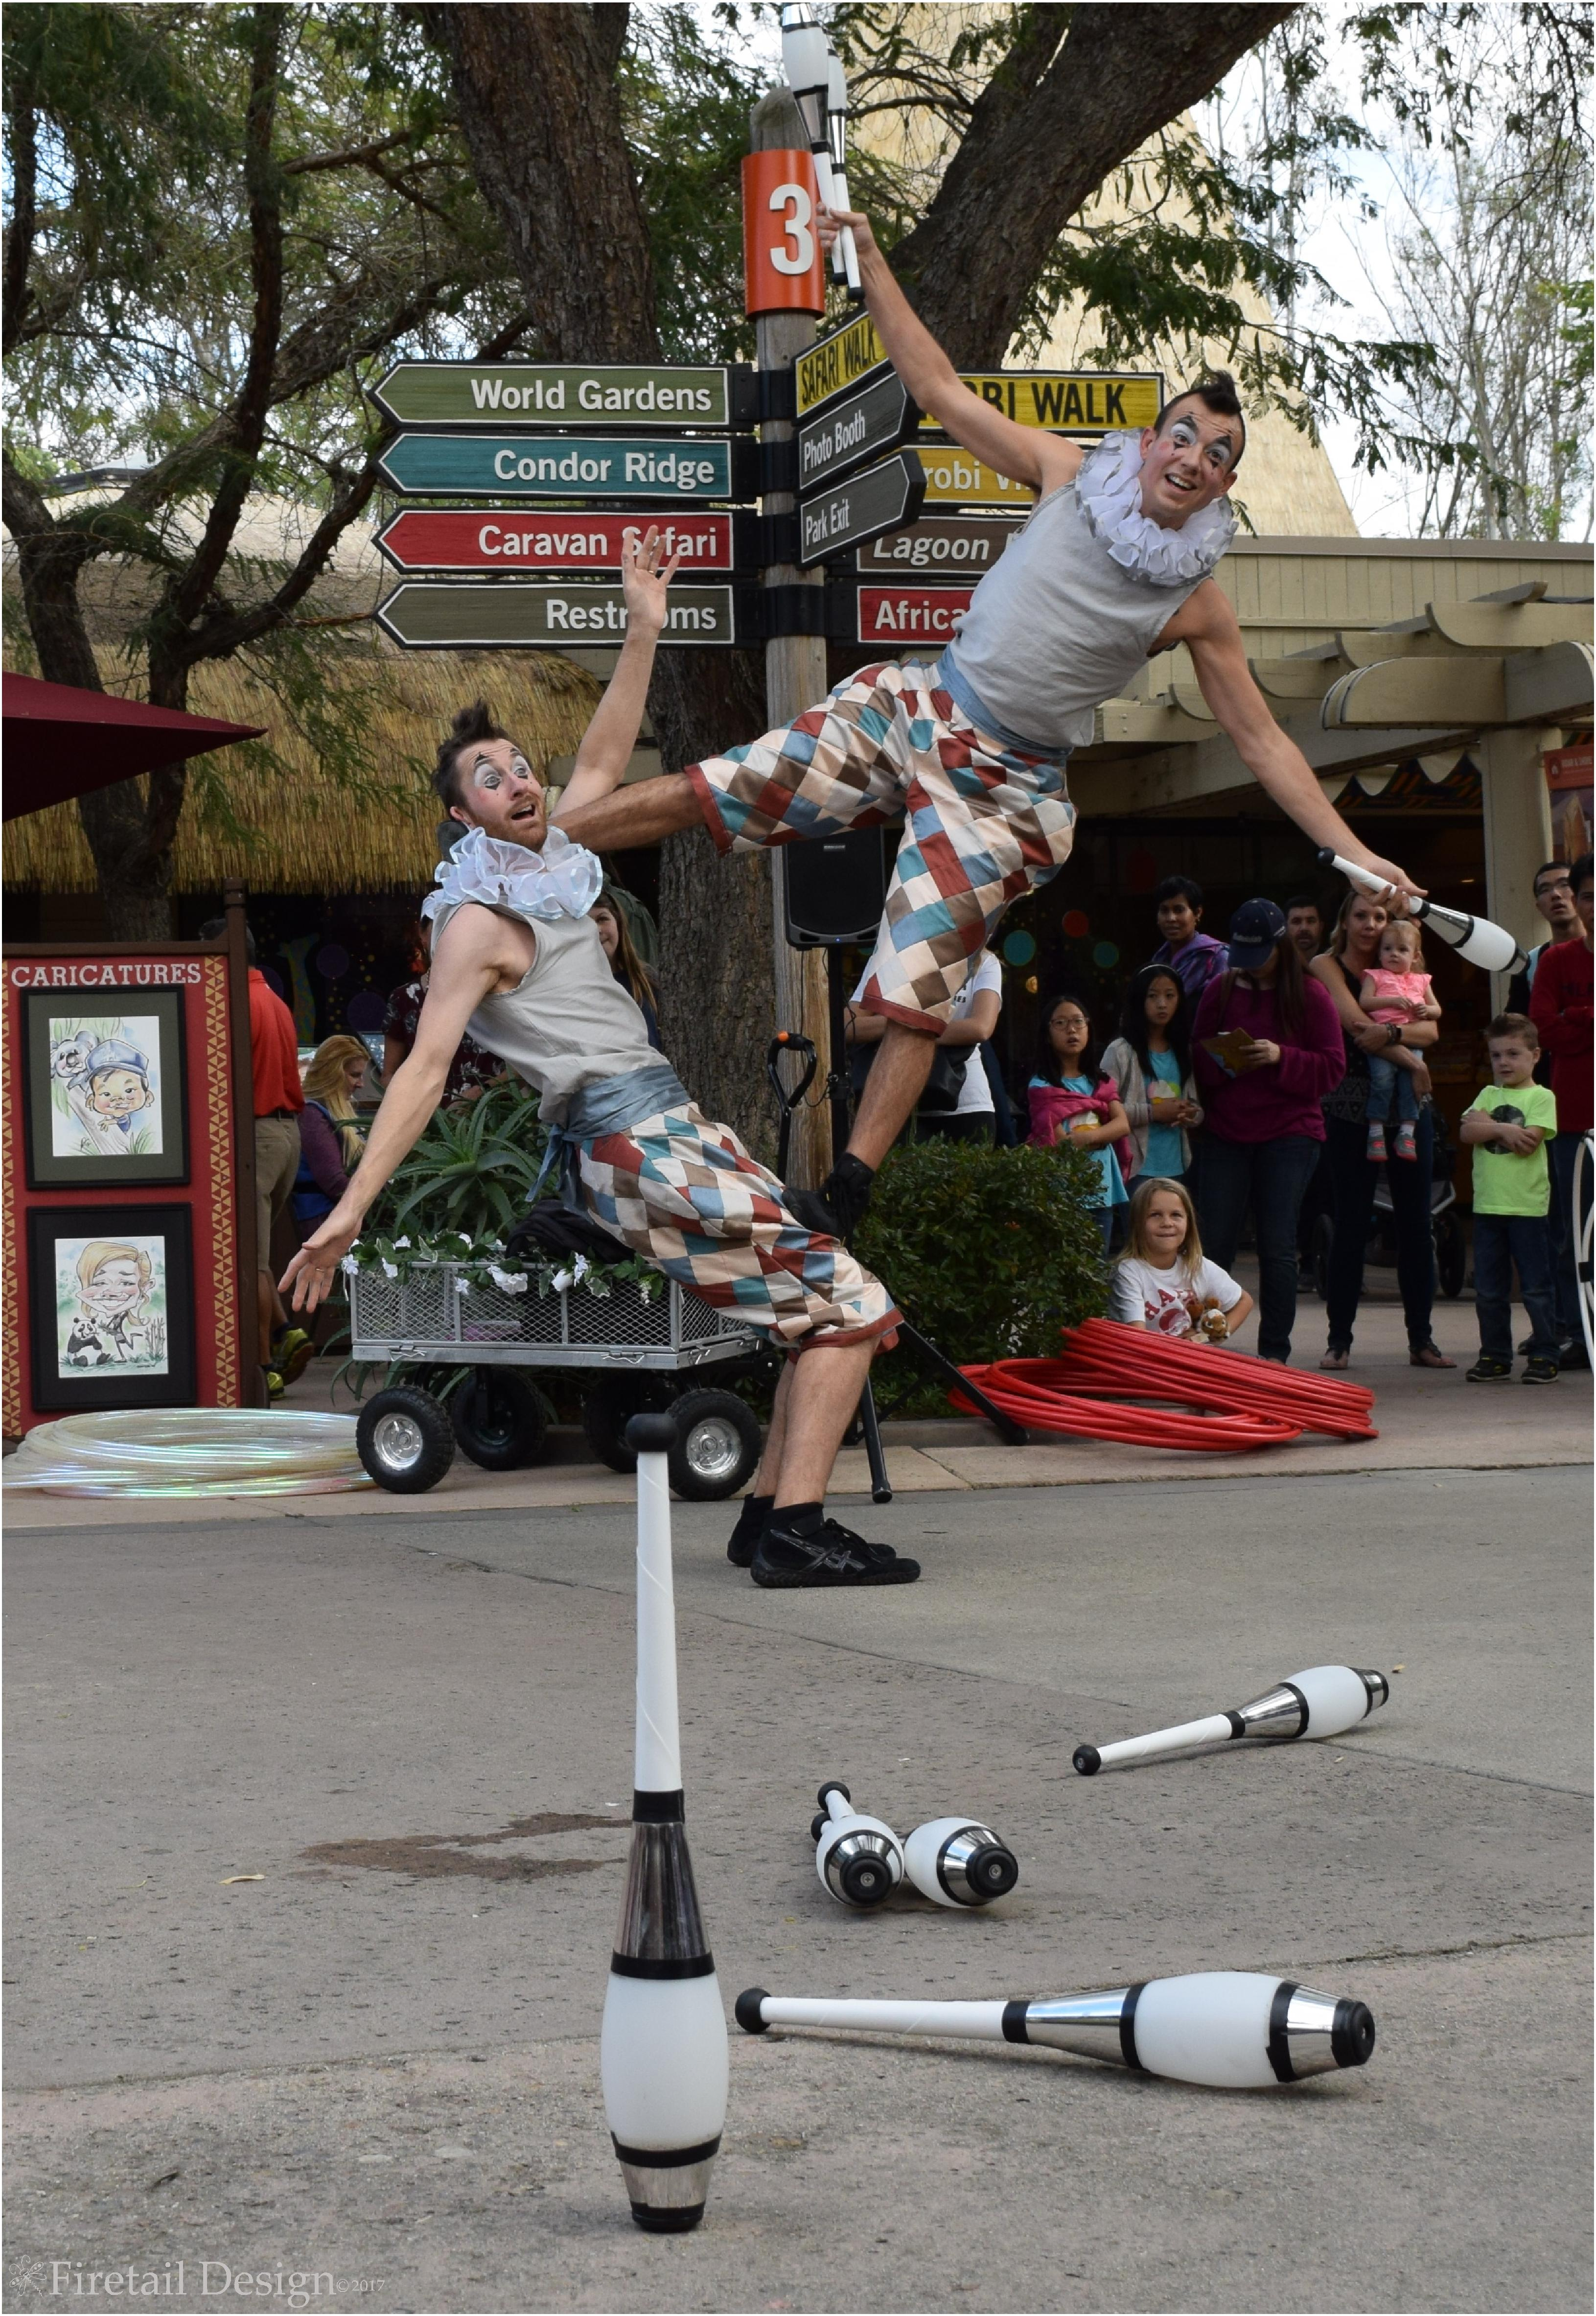 Harlequin Performers